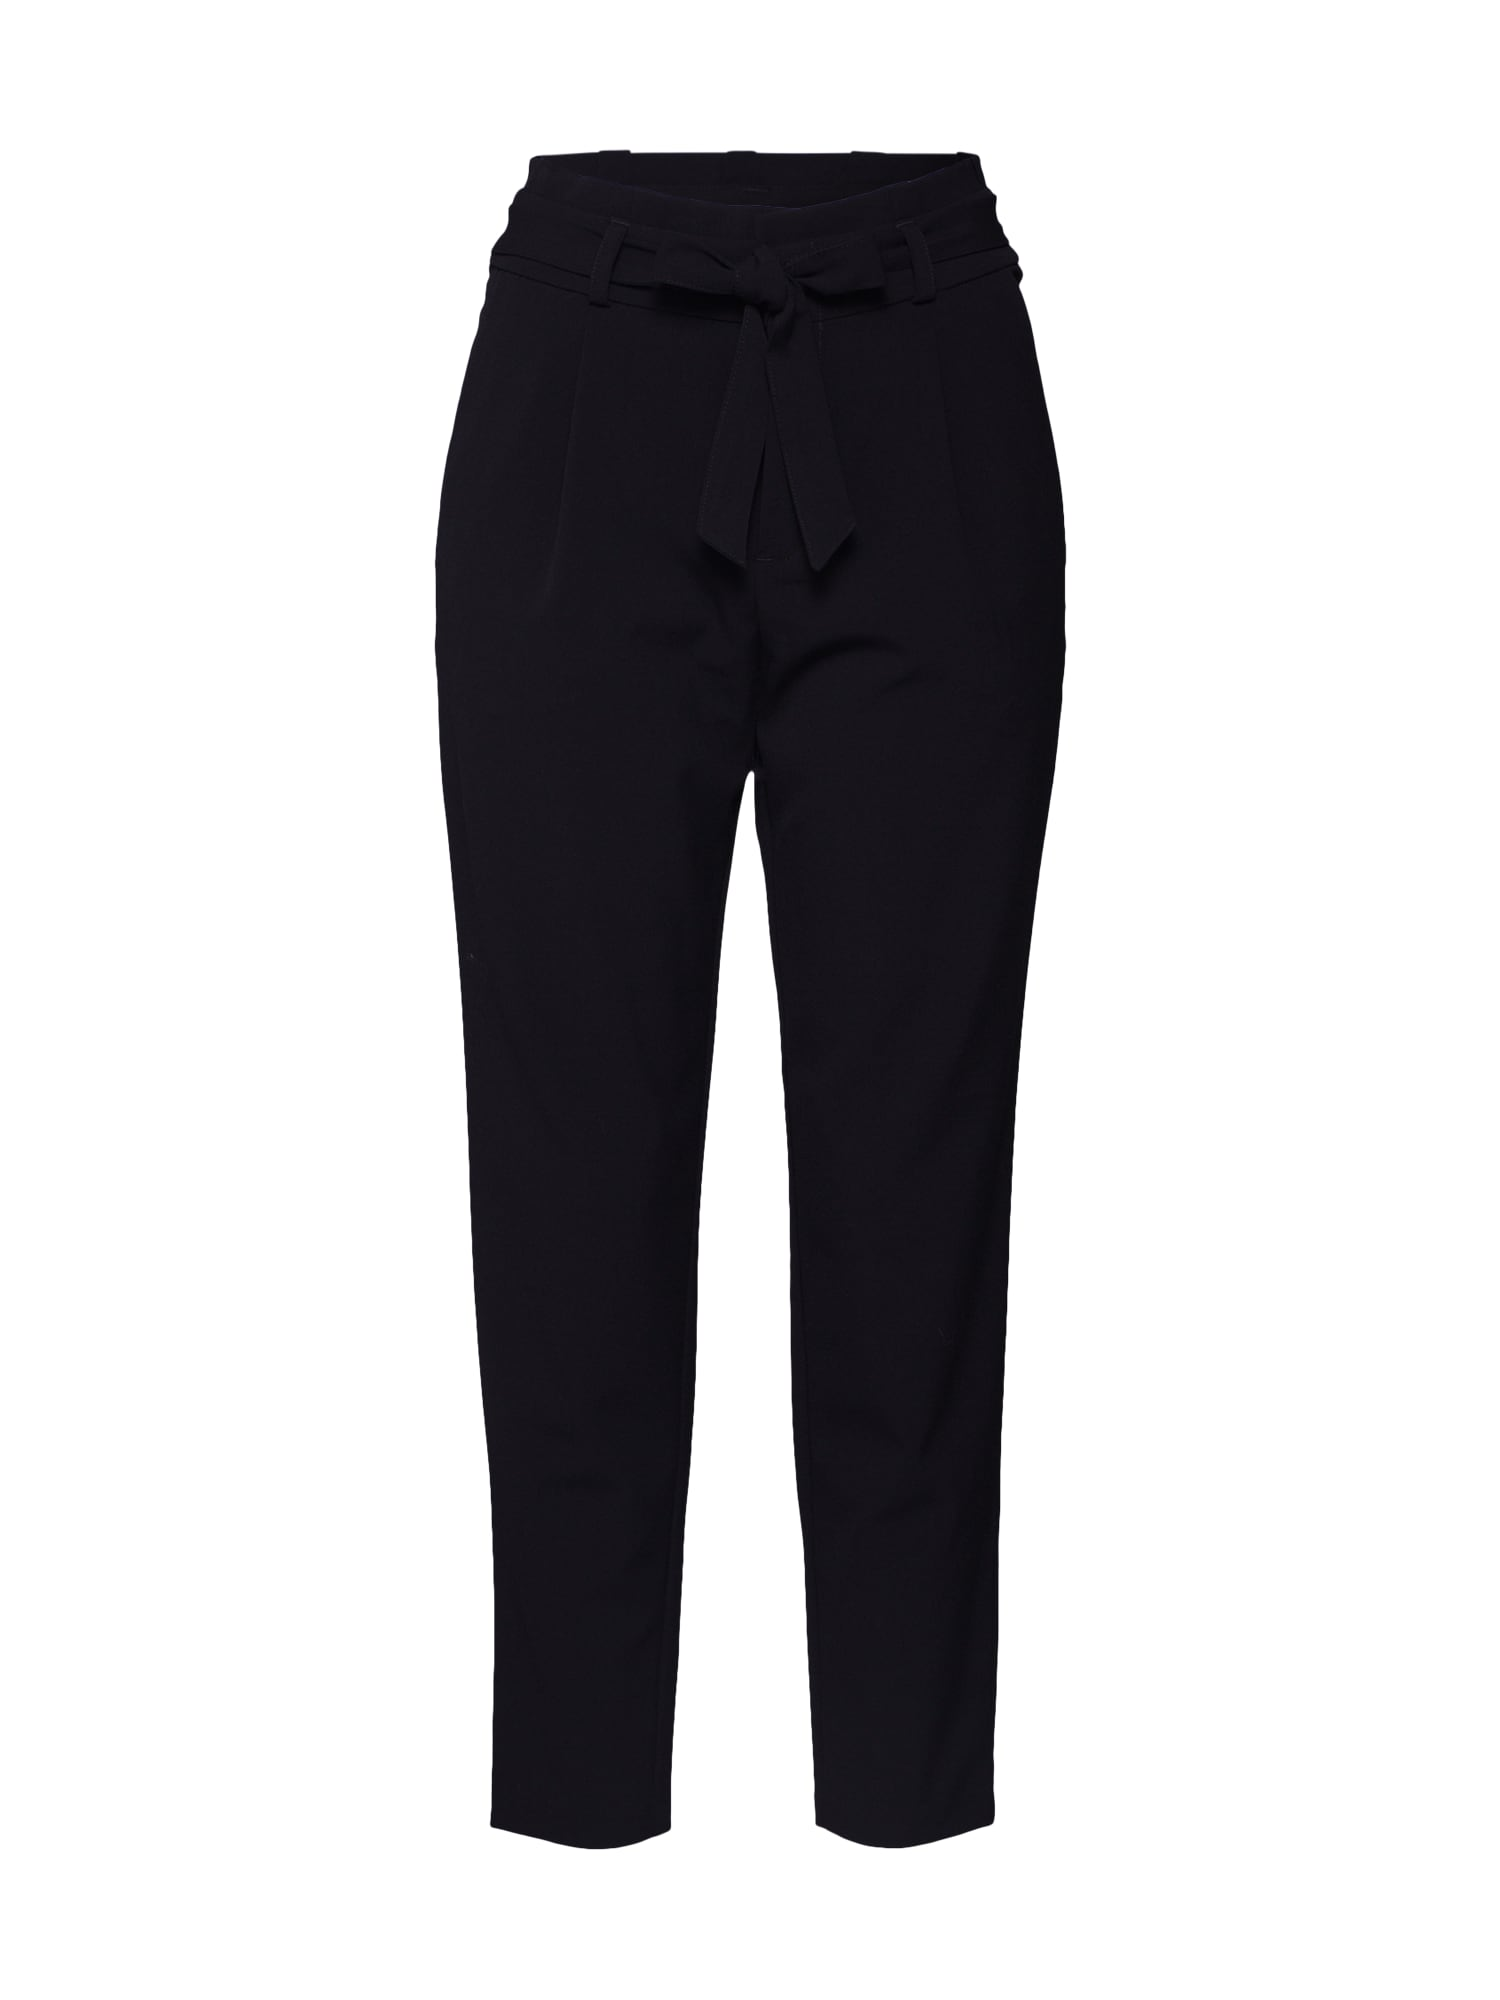 TOM TAILOR DENIM Plisované nohavice 'Paperbag'  čierna